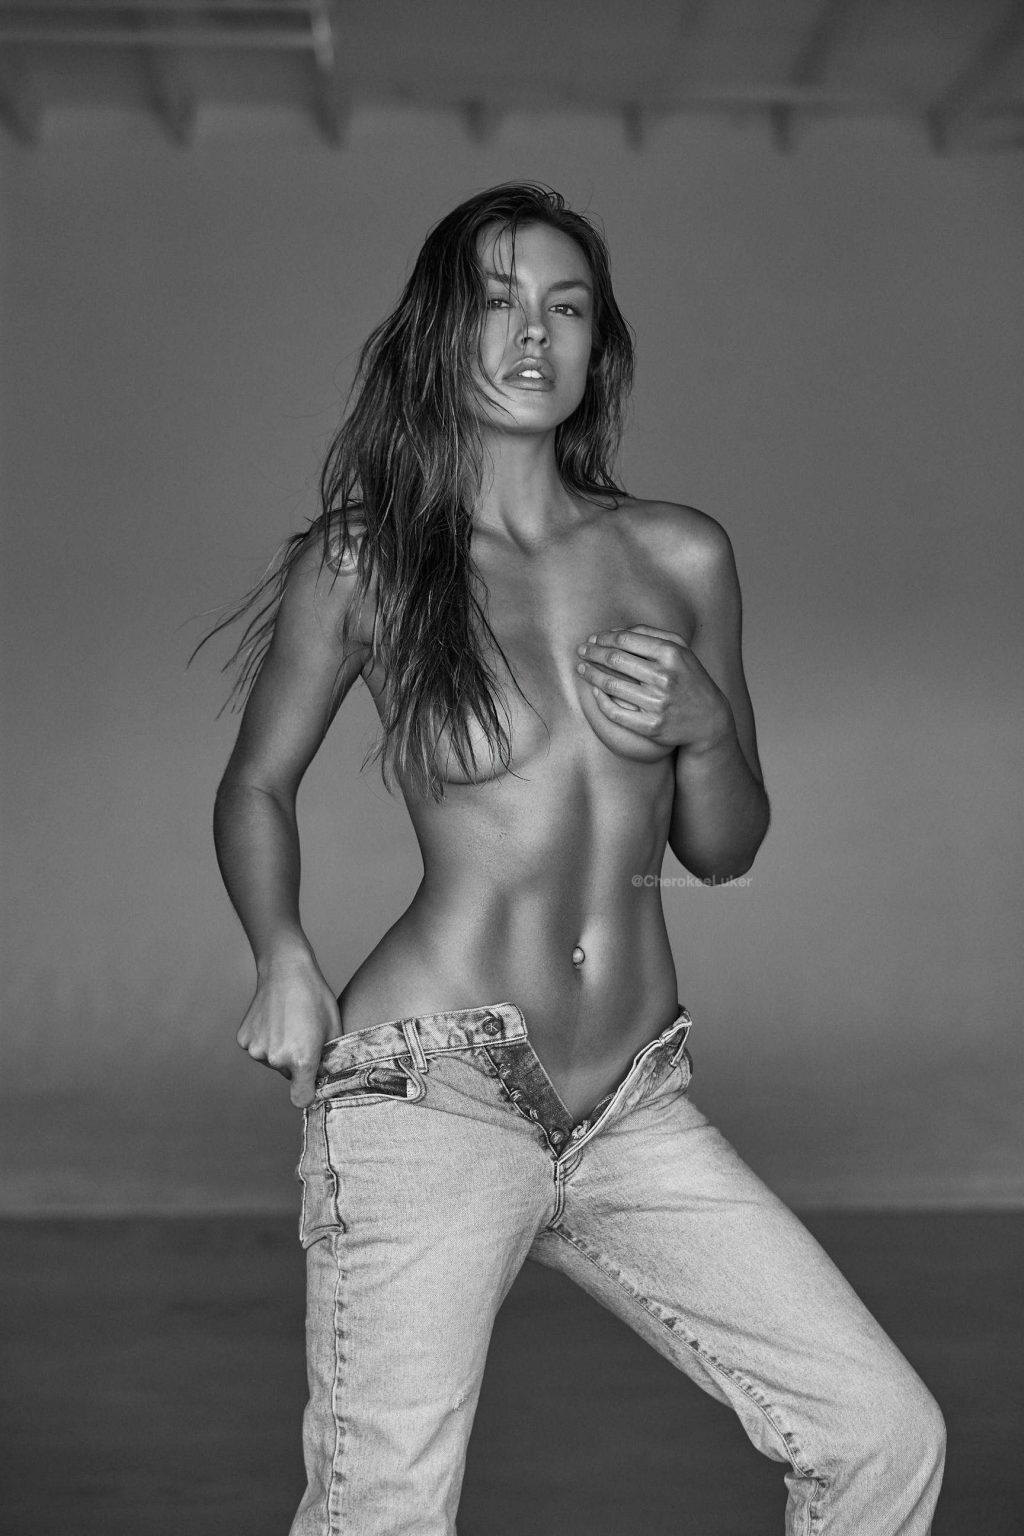 Fit-Naked-Girls-com-Cherokee-Luker-nude-fit-7-1024x1536